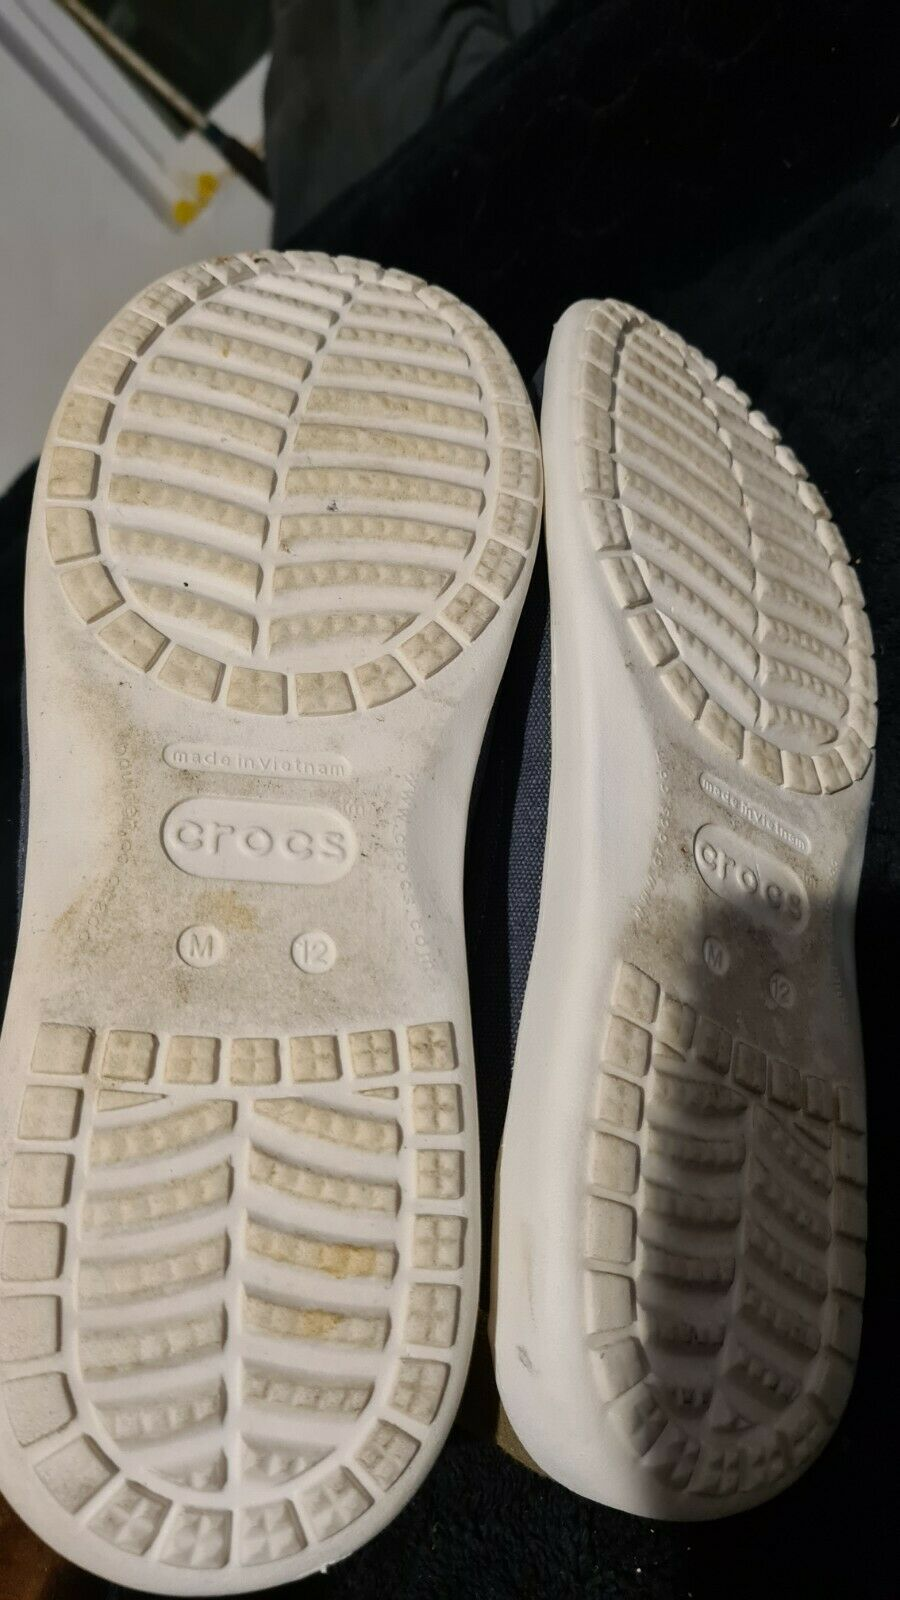 crocs canvas slippers  12M - image 6